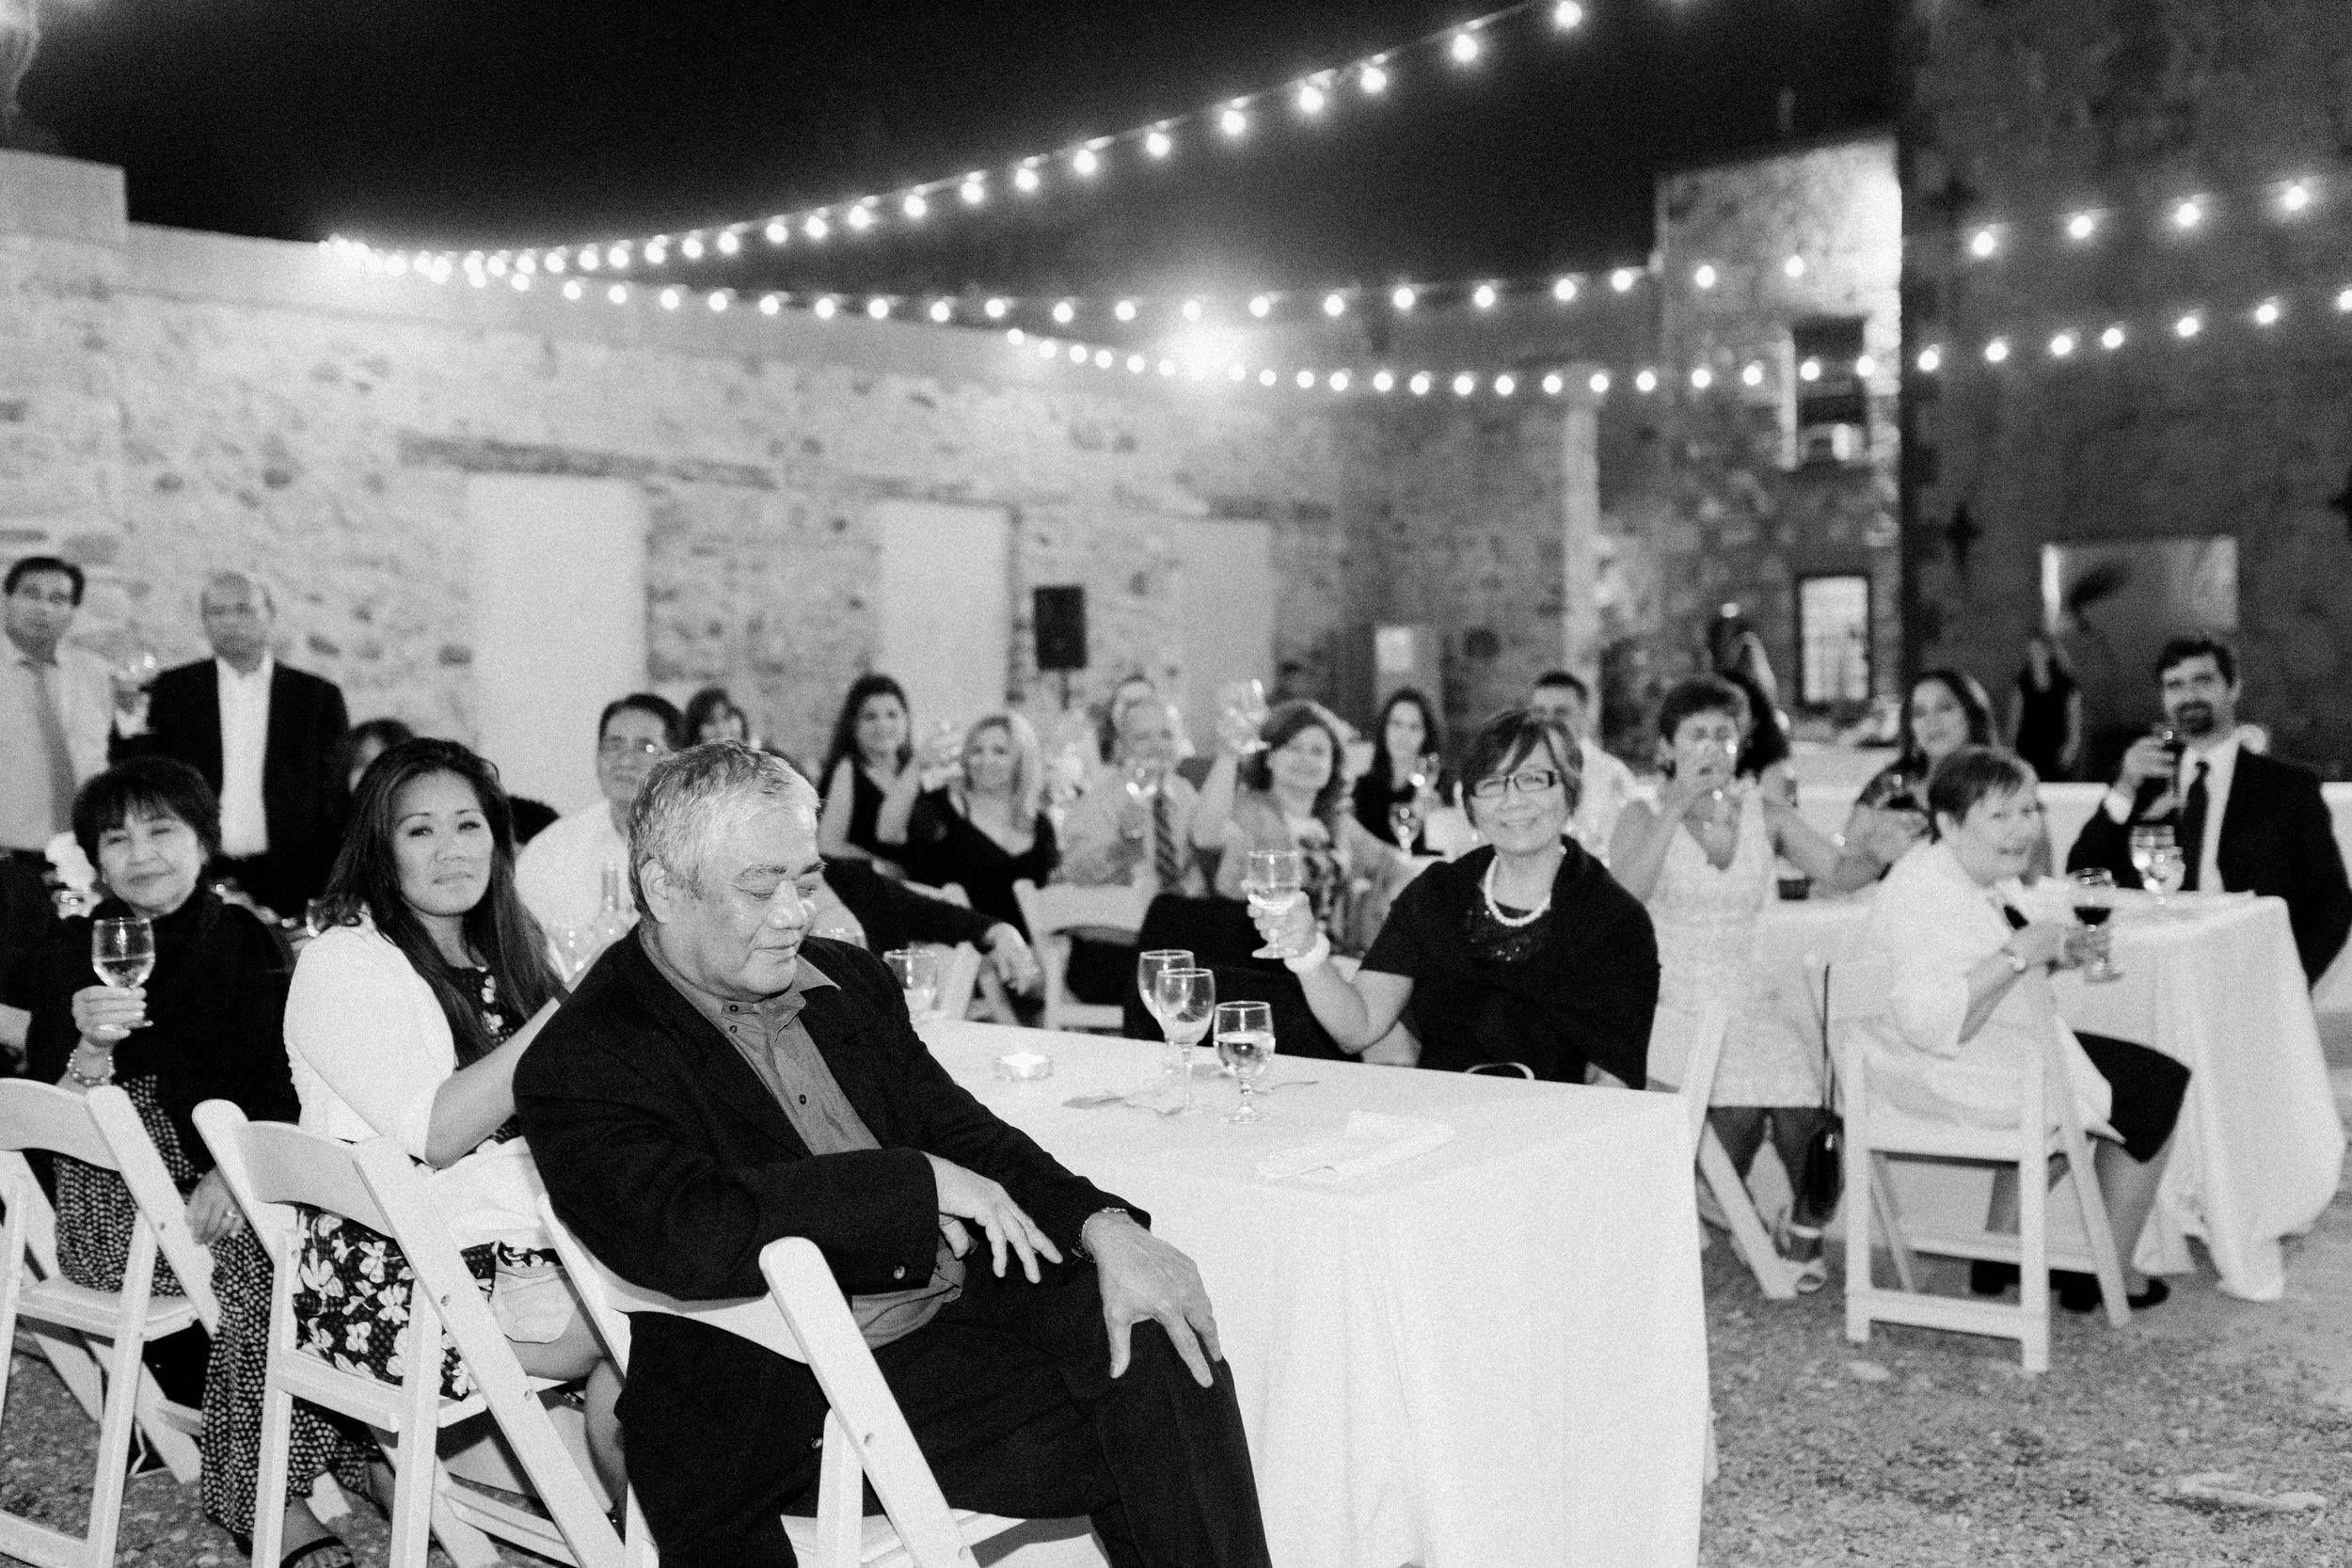 Alton Mills Wedding - Reception-145.jpg